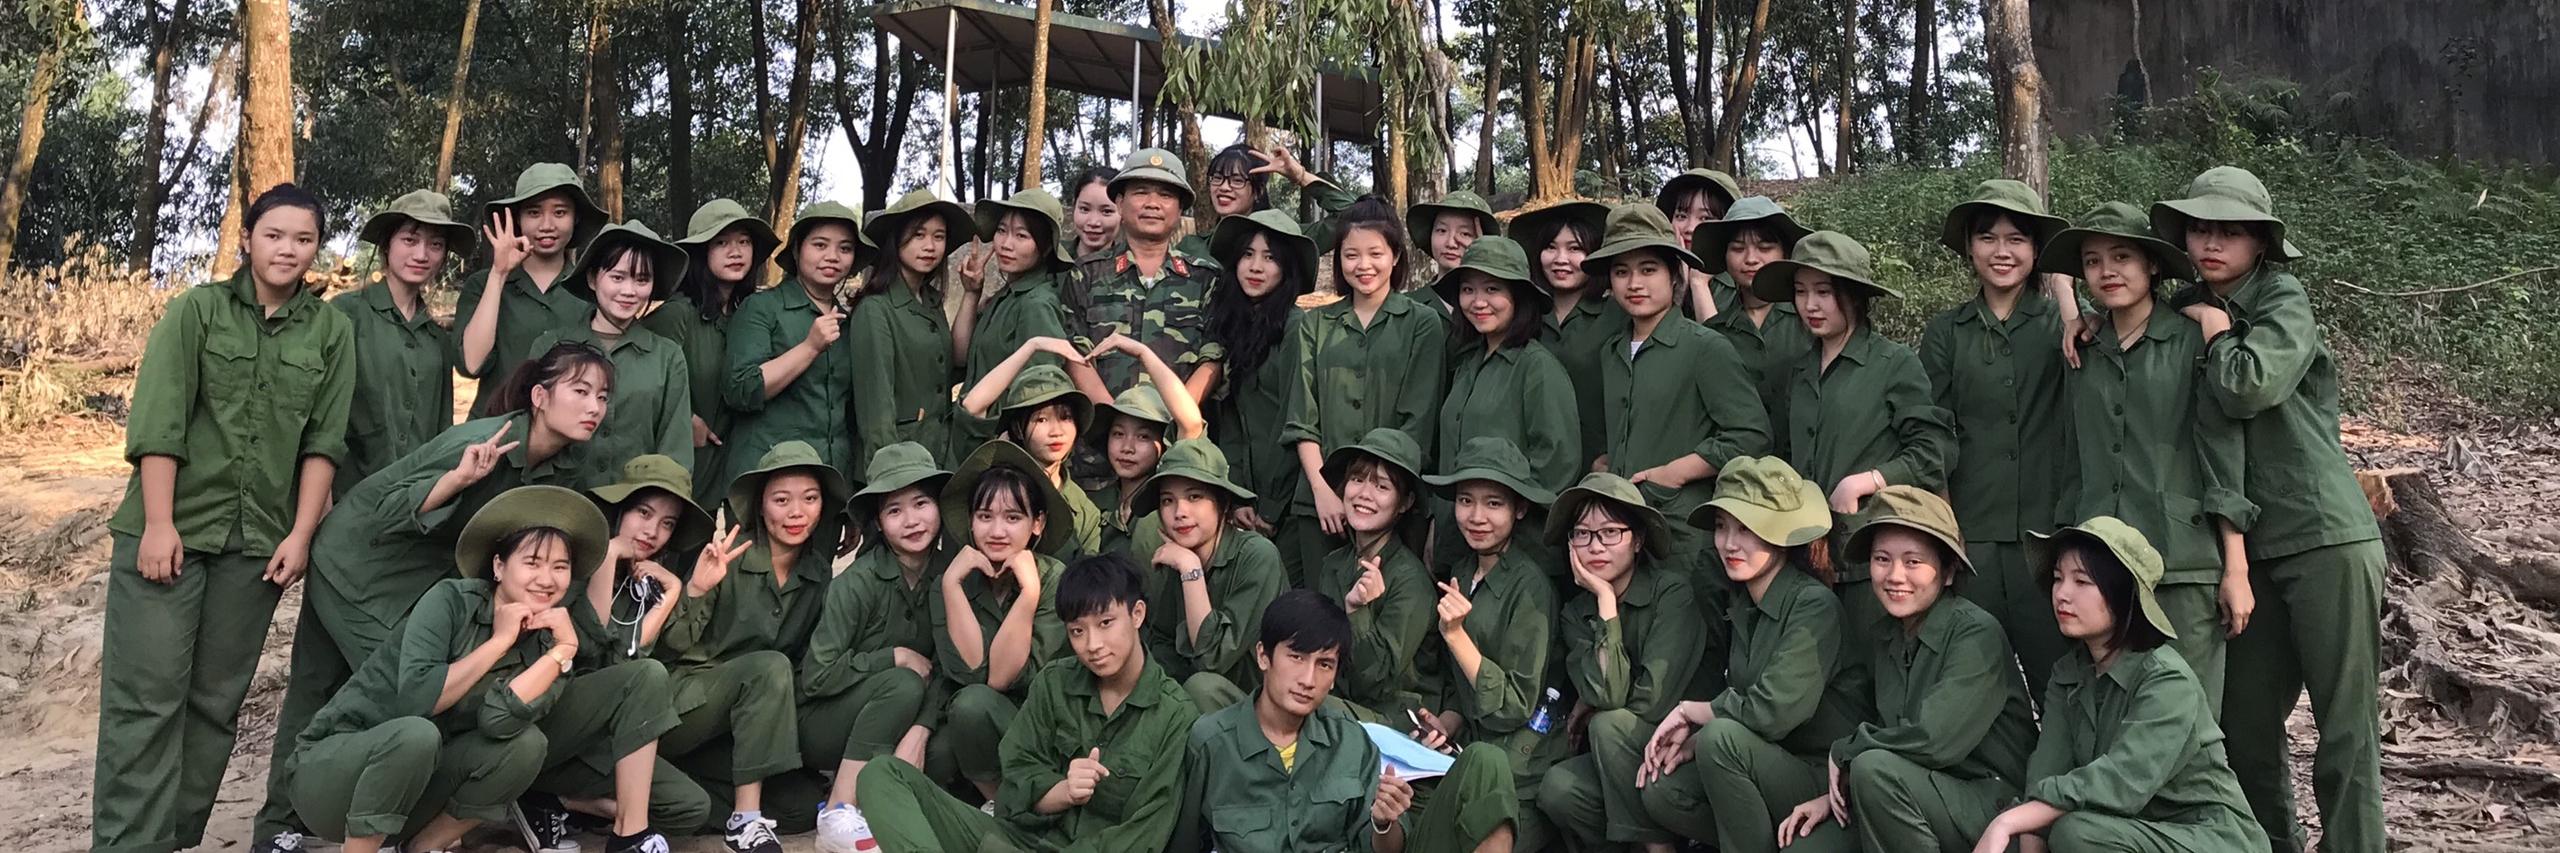 https://gody.vn/blog/tranhangkp4357/post/hoc-quan-su-vui-nhu-the-nao-7130